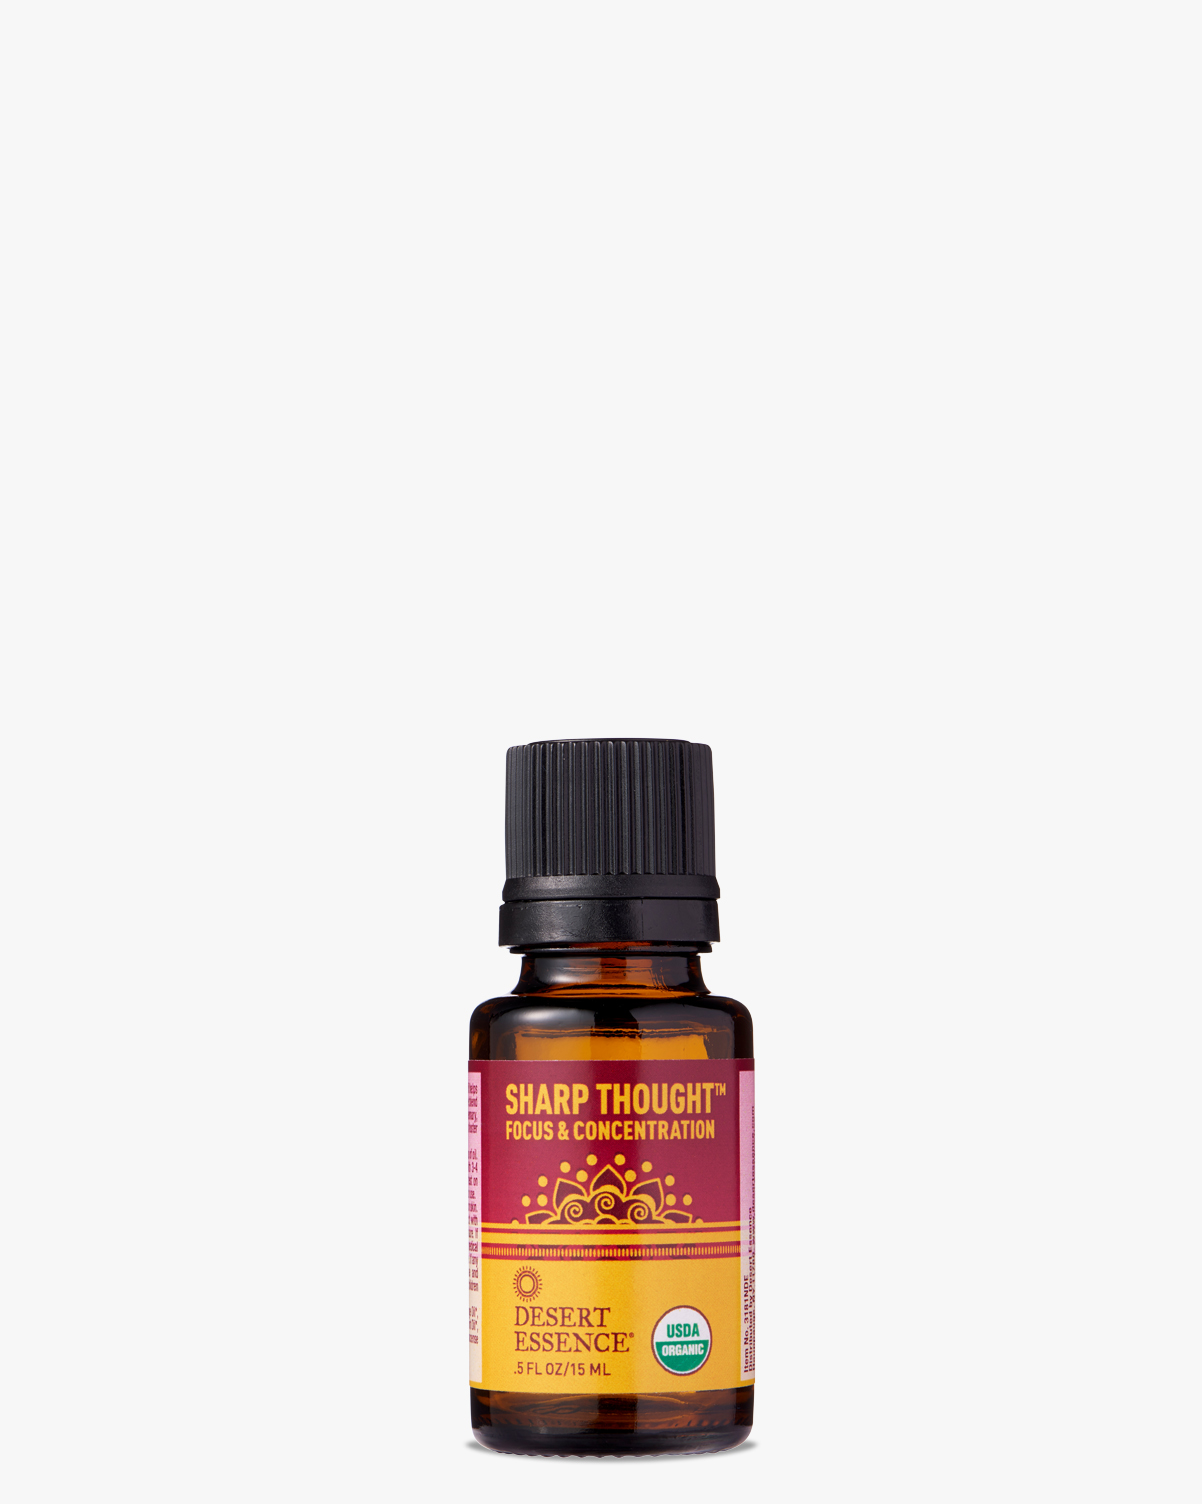 Desert Essence coupon: Desert Essence Sharp Thought Organic Essential Oil, 0.5 fl. oz. | Vegan | Gluten-Free